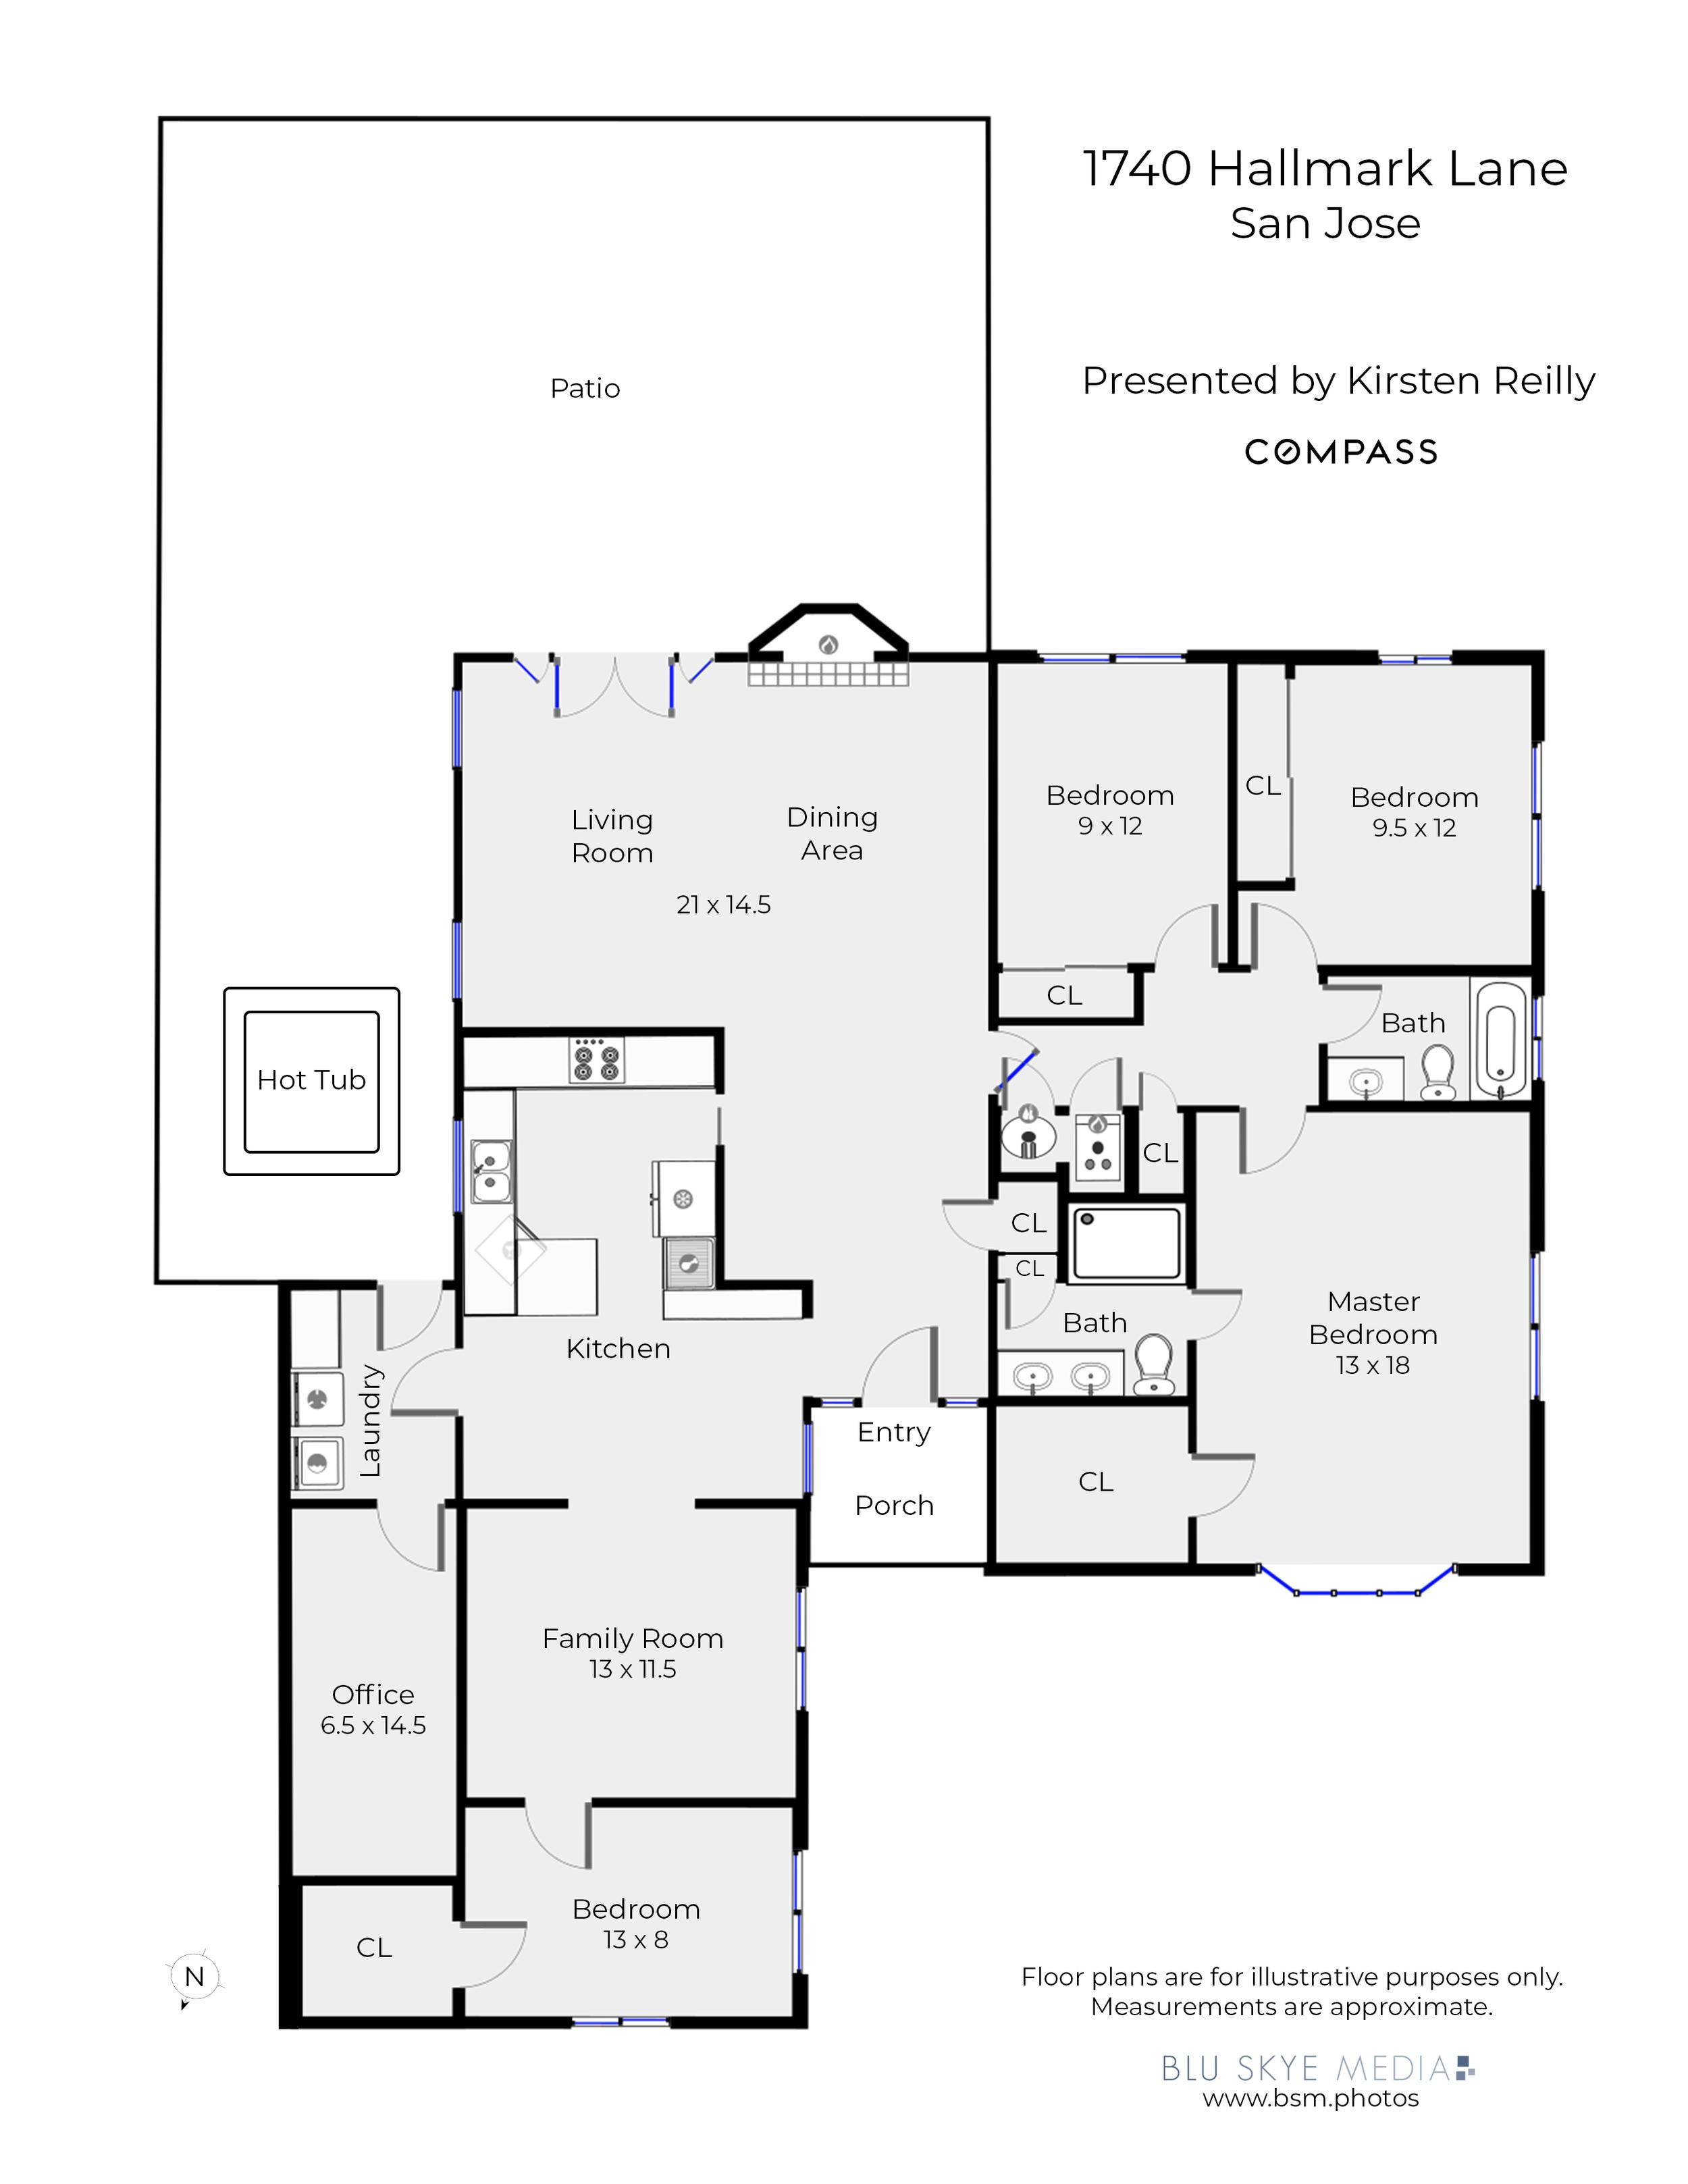 1740 Hallmark Ln, San Jose Floor Plan.png